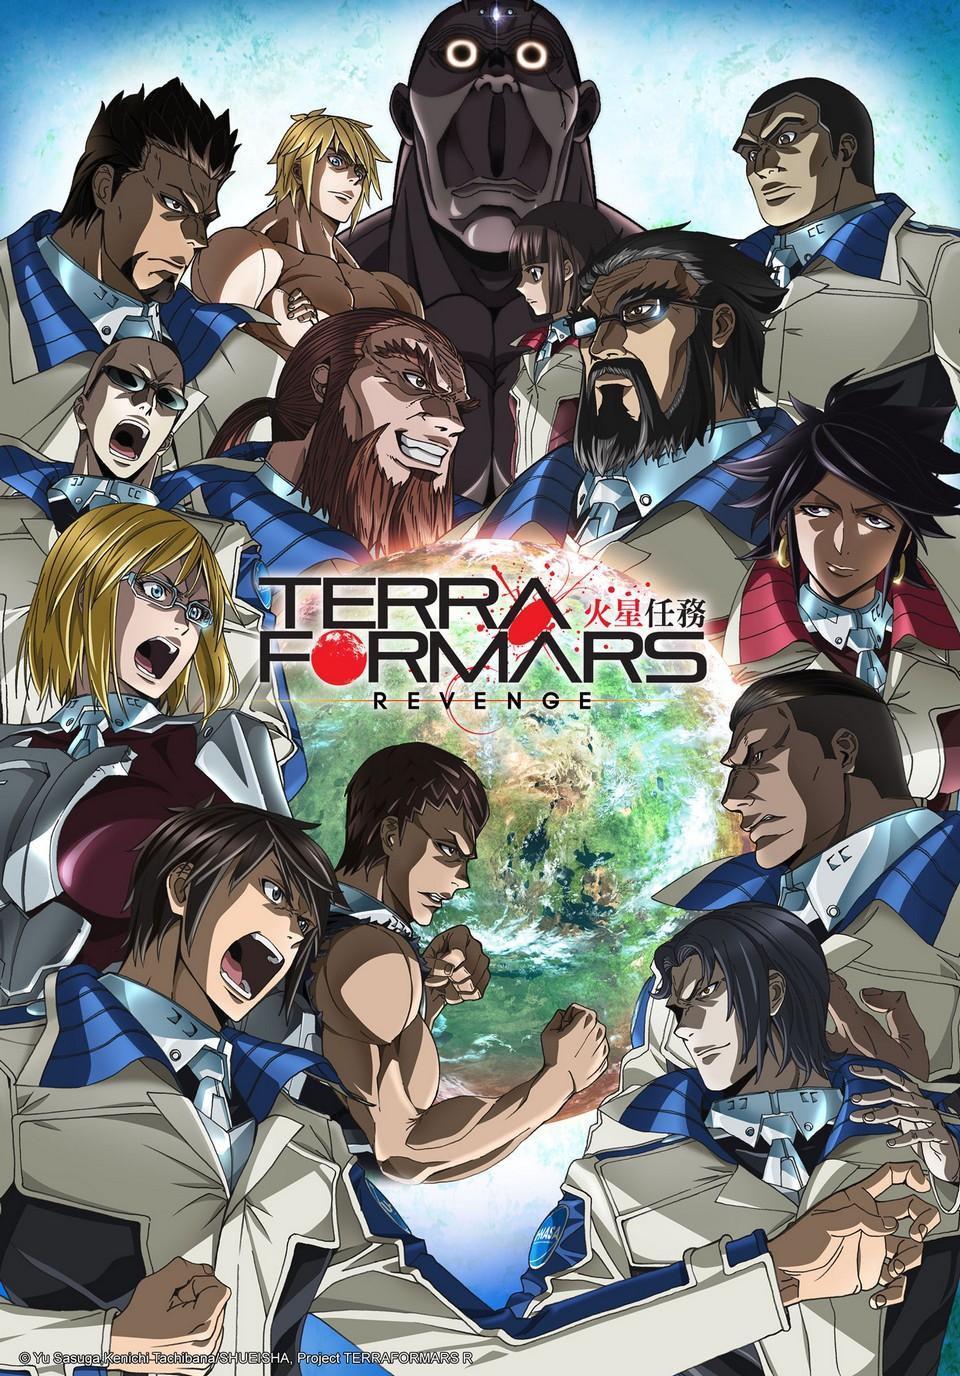 Terra Formars Revenge |13/13| |Castellano| |Temporada 2| |HD 720p| |Mega|